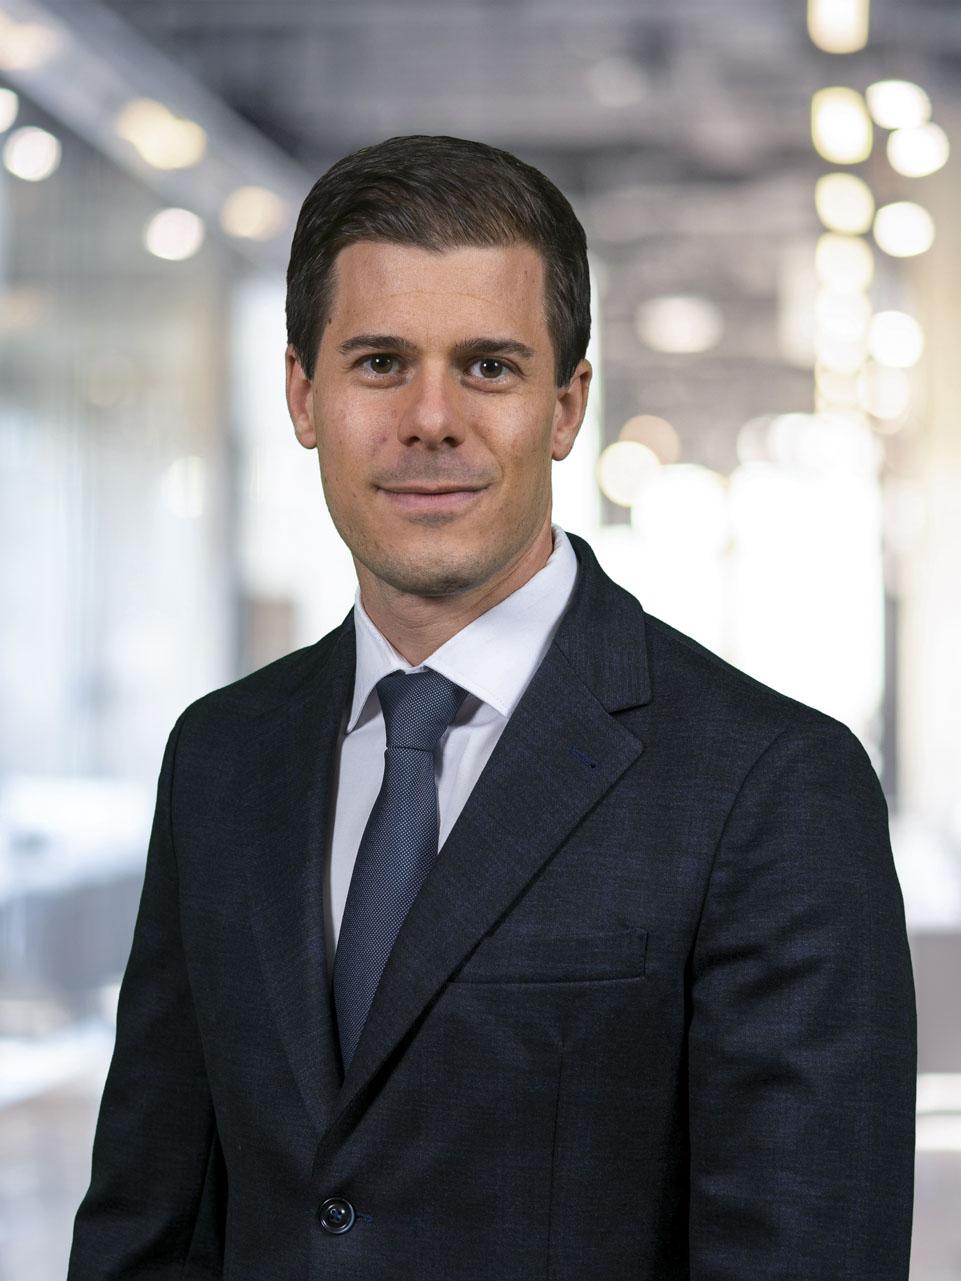 Salzburger Notariatskammer: MMag. Dr. Christoph Hofer